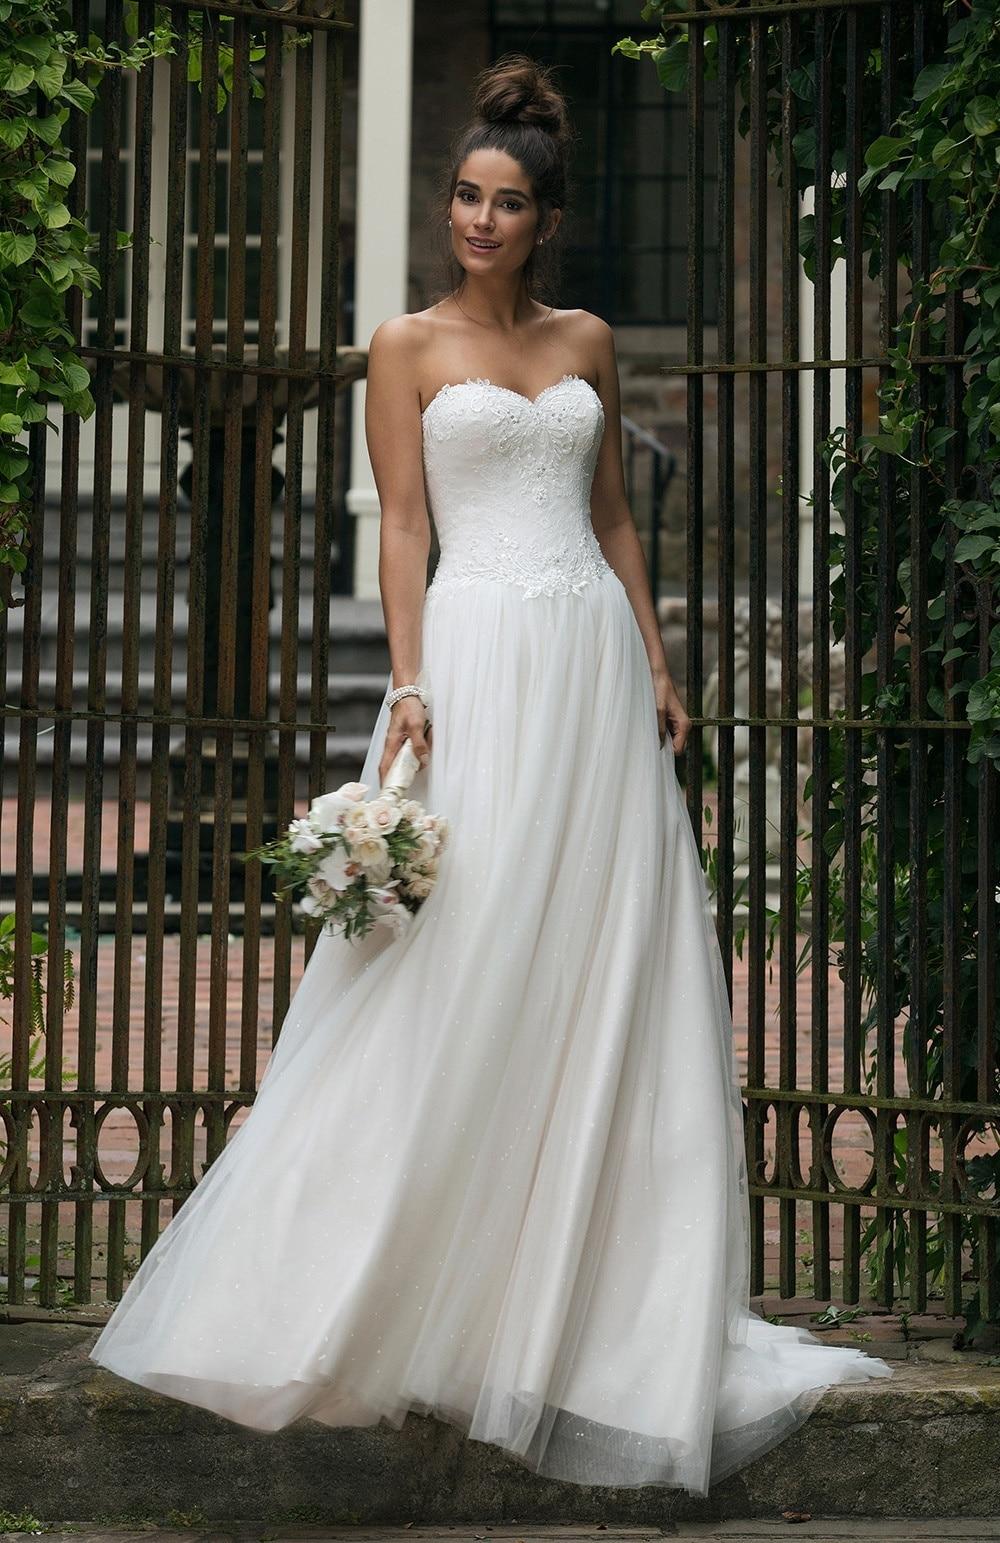 Robe de mariée Modèle 44065 – Shanone